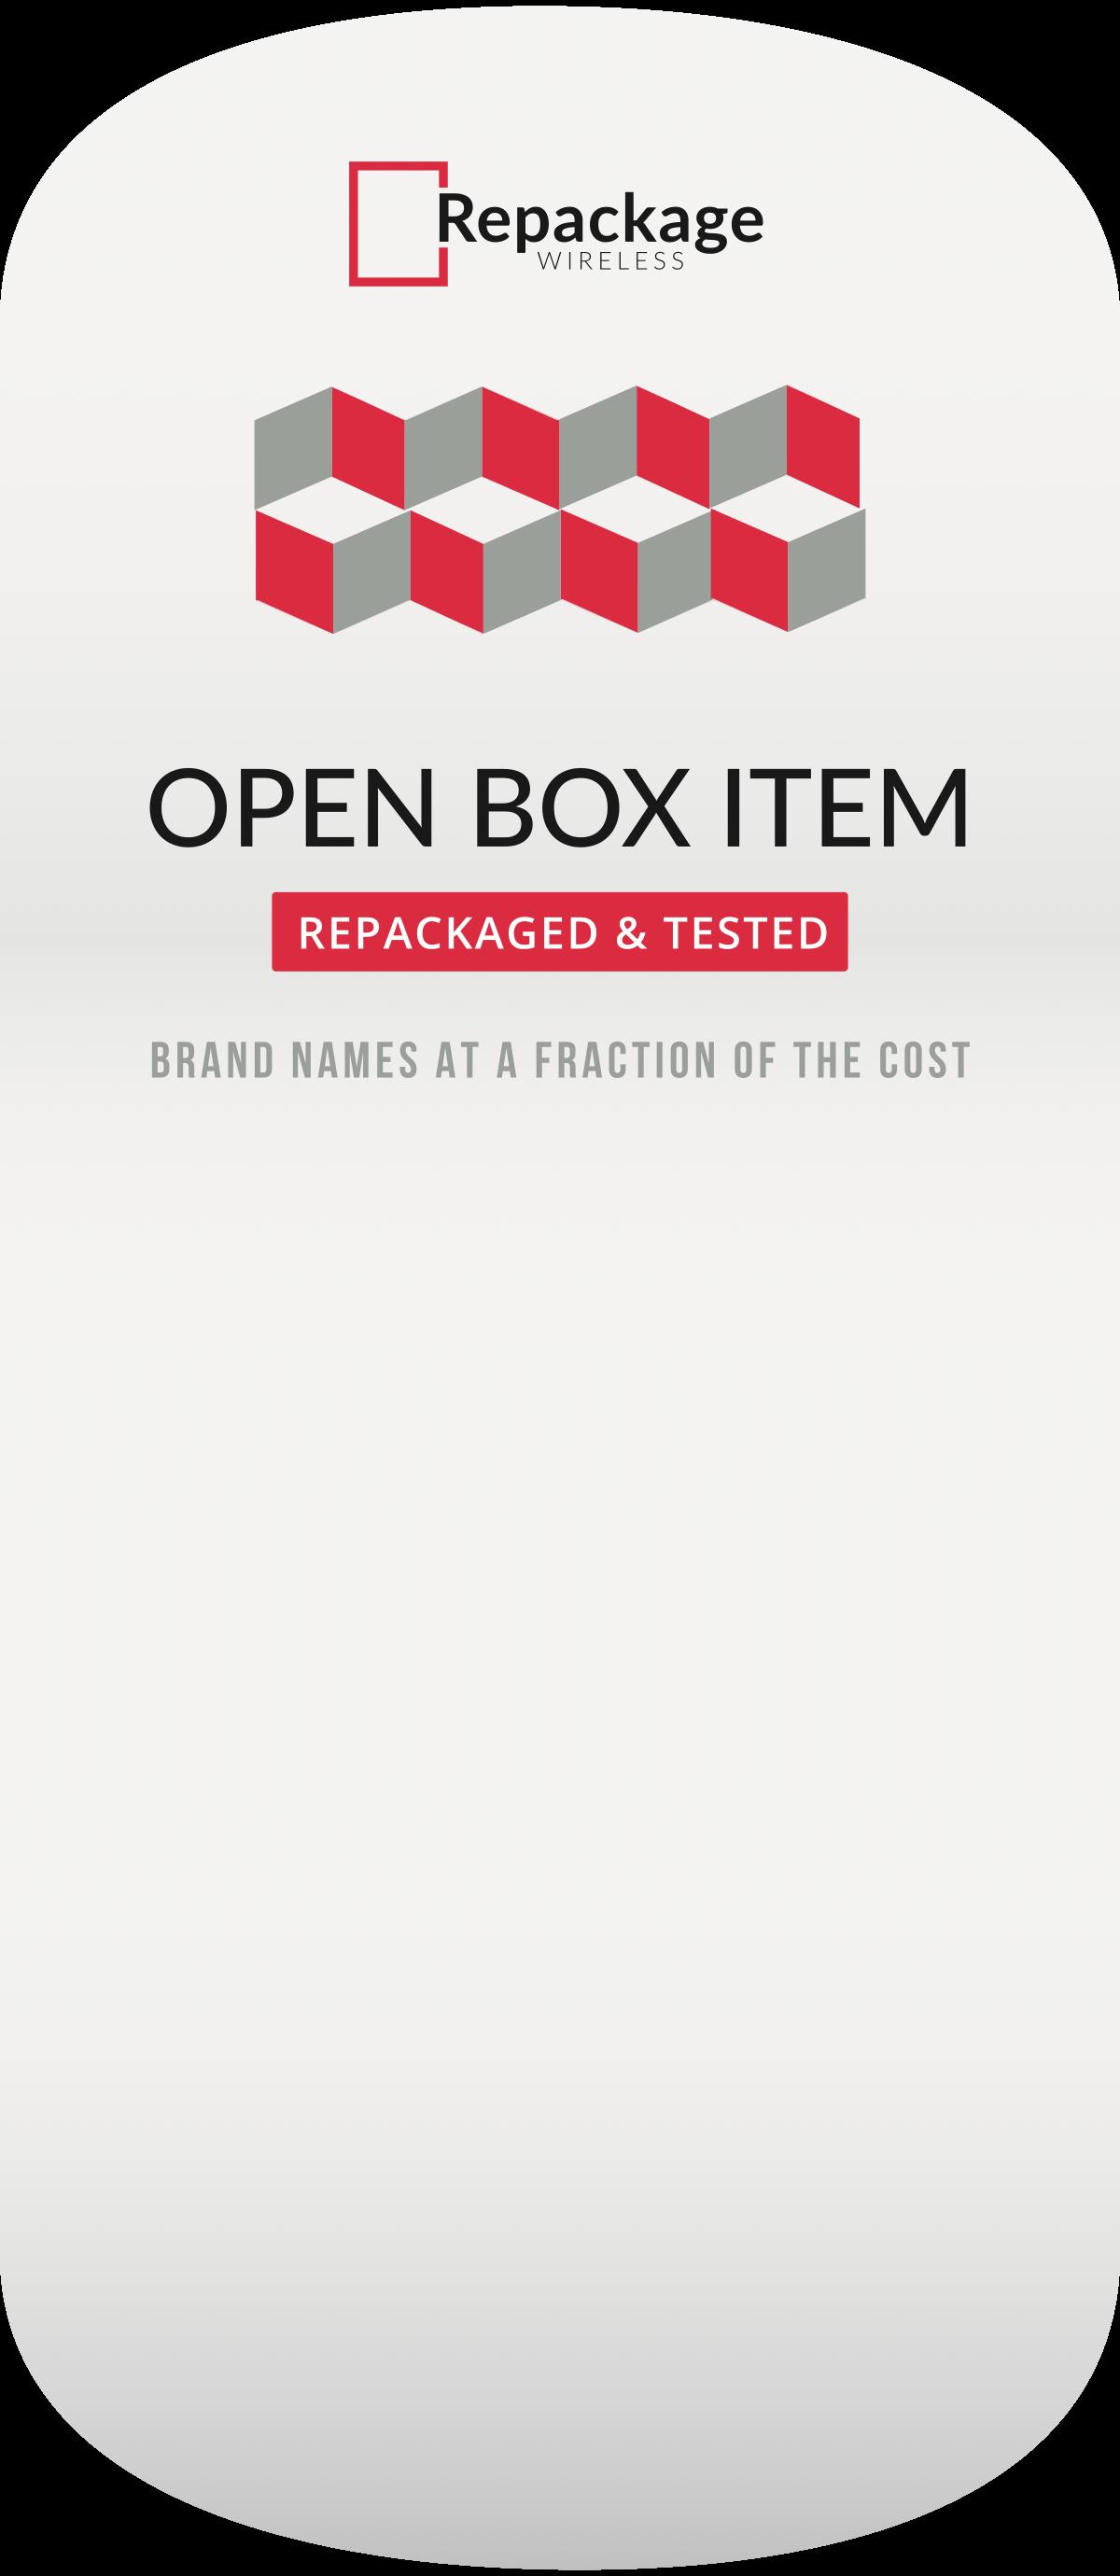 Repackage Wireless Brand